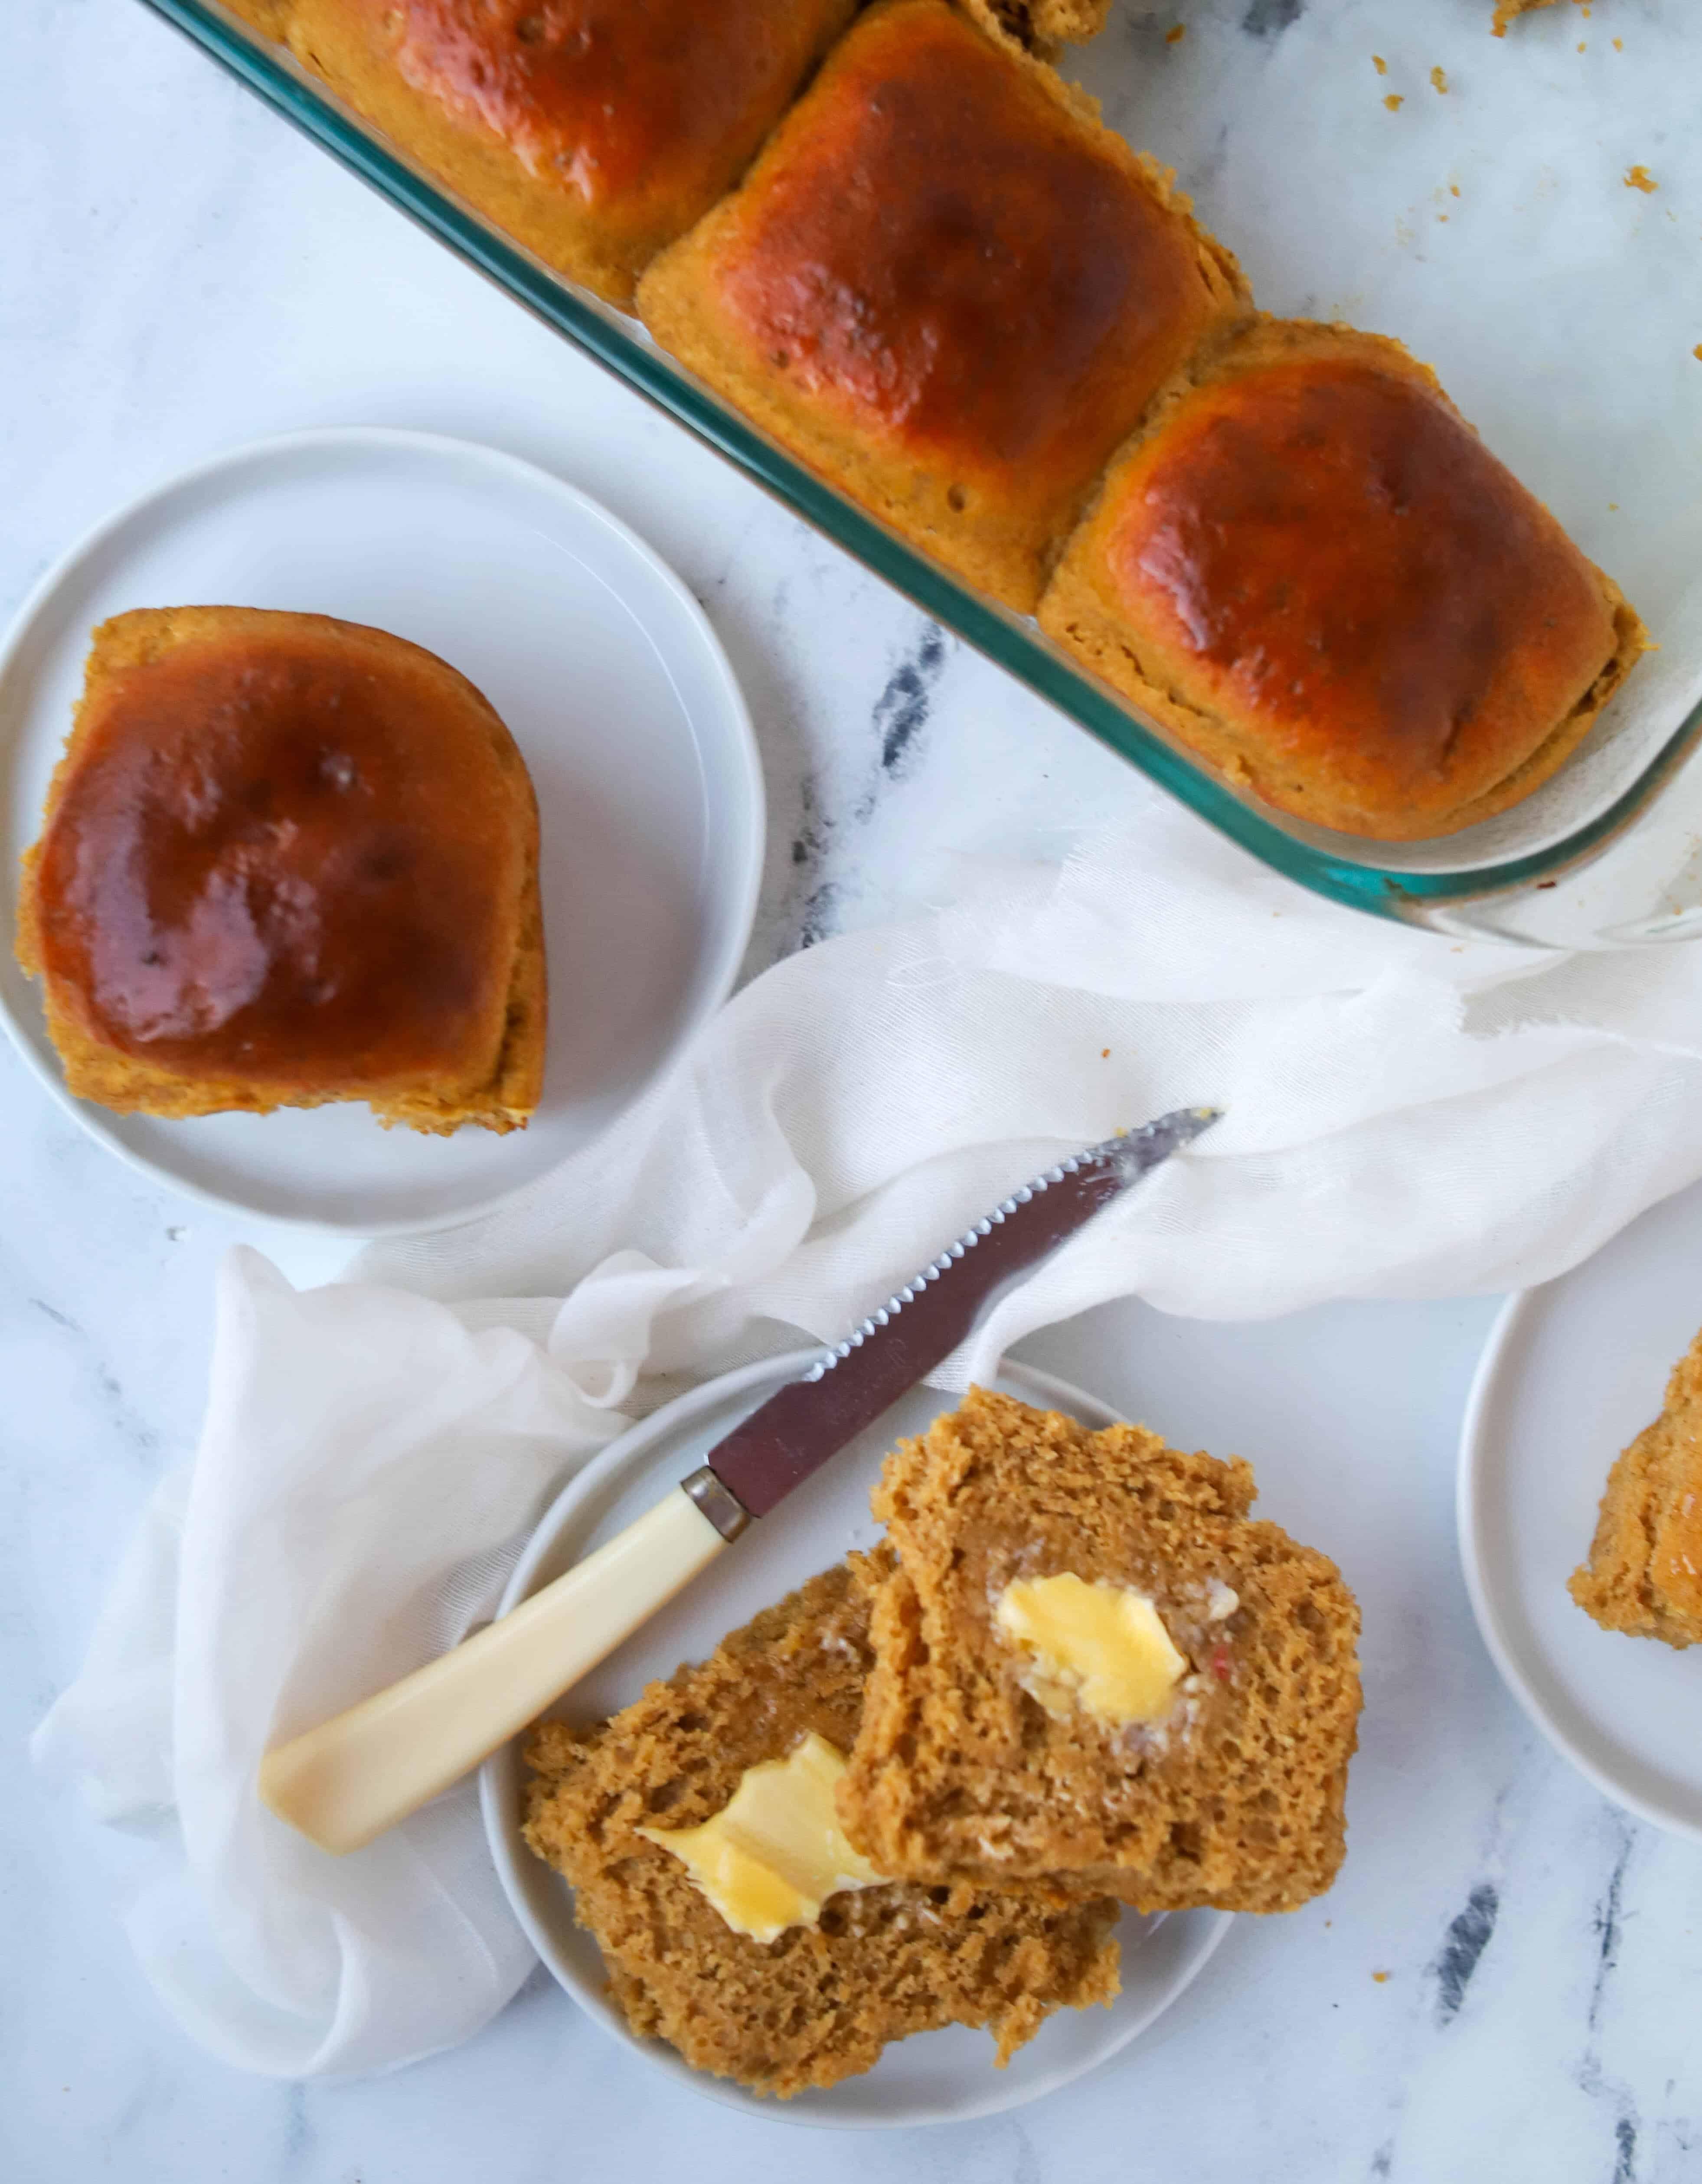 pumpkin roll split in half and buttered